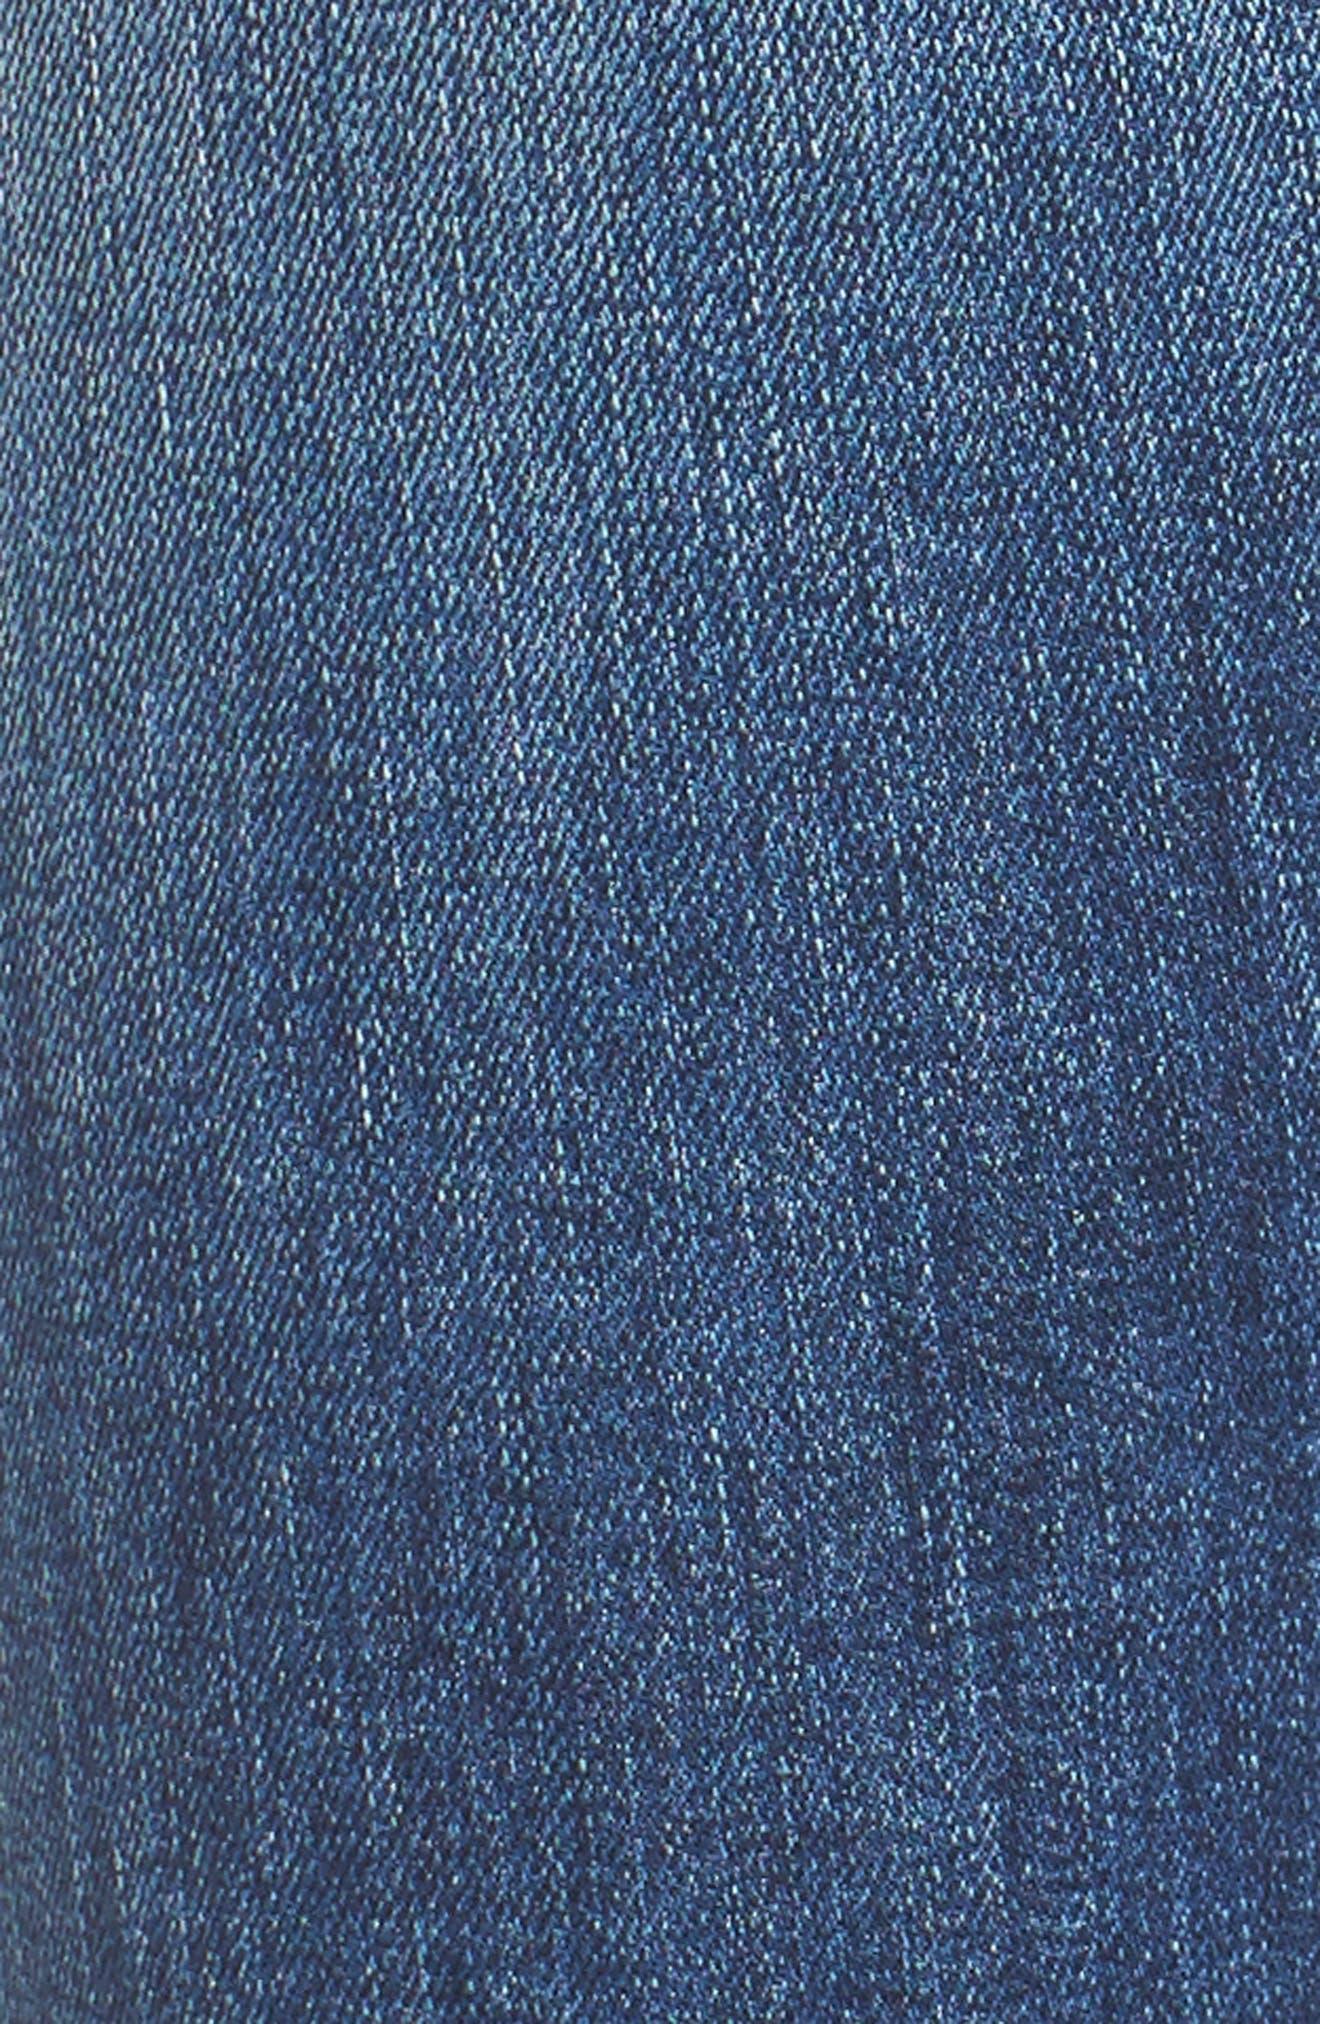 Alternate Image 5  - Hudson Jeans Harper High Waist Crop Flare Jeans (Lifeline)